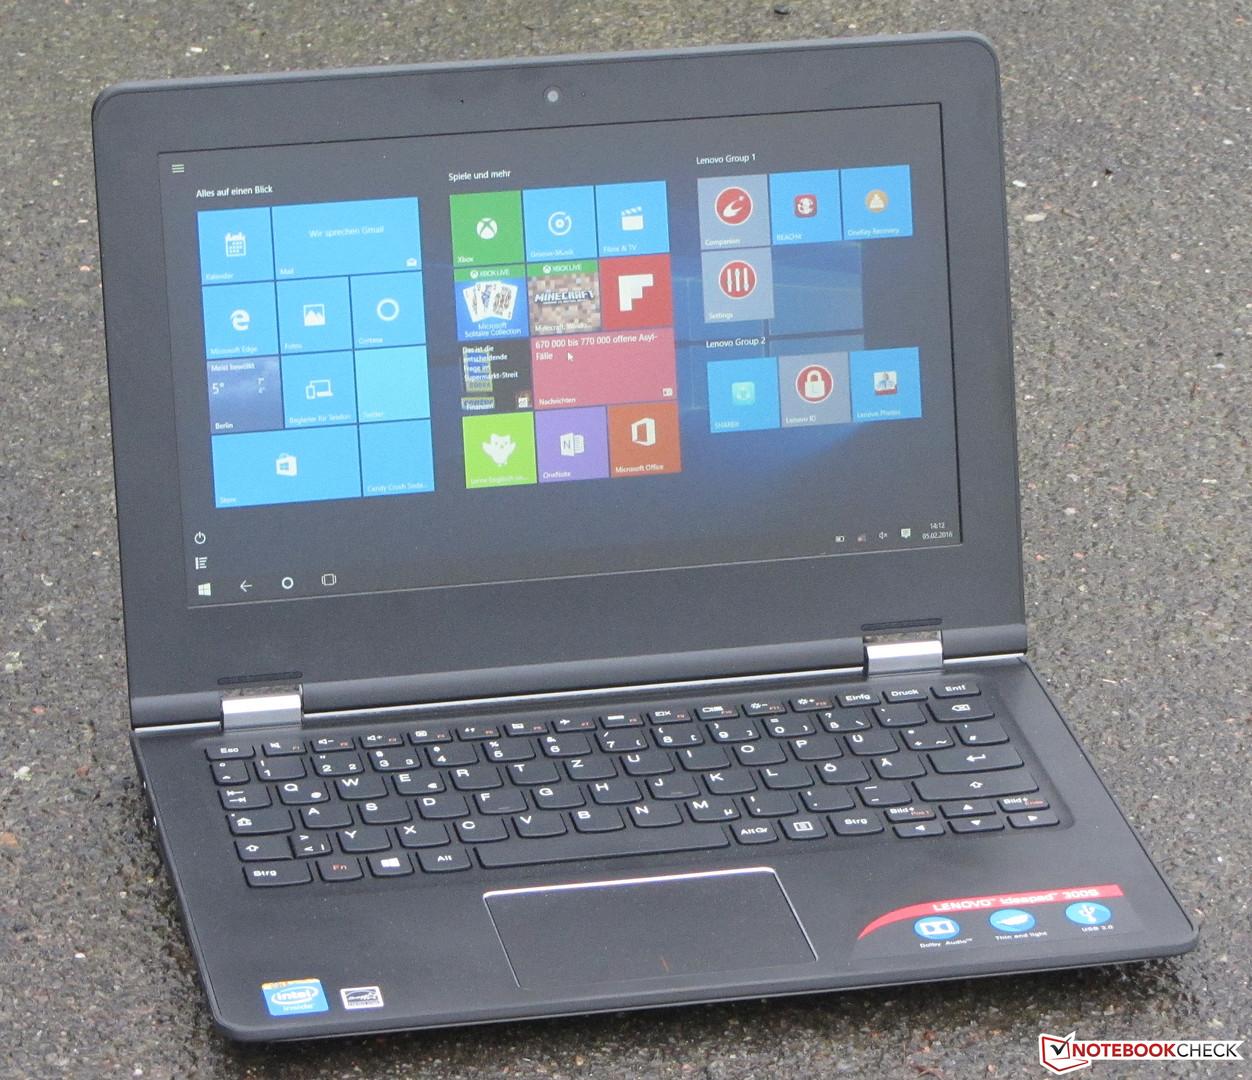 Lenovo IdeaPad SIBR Netbook Review NotebookChecknet Reviews - Minecraft laptop spielen